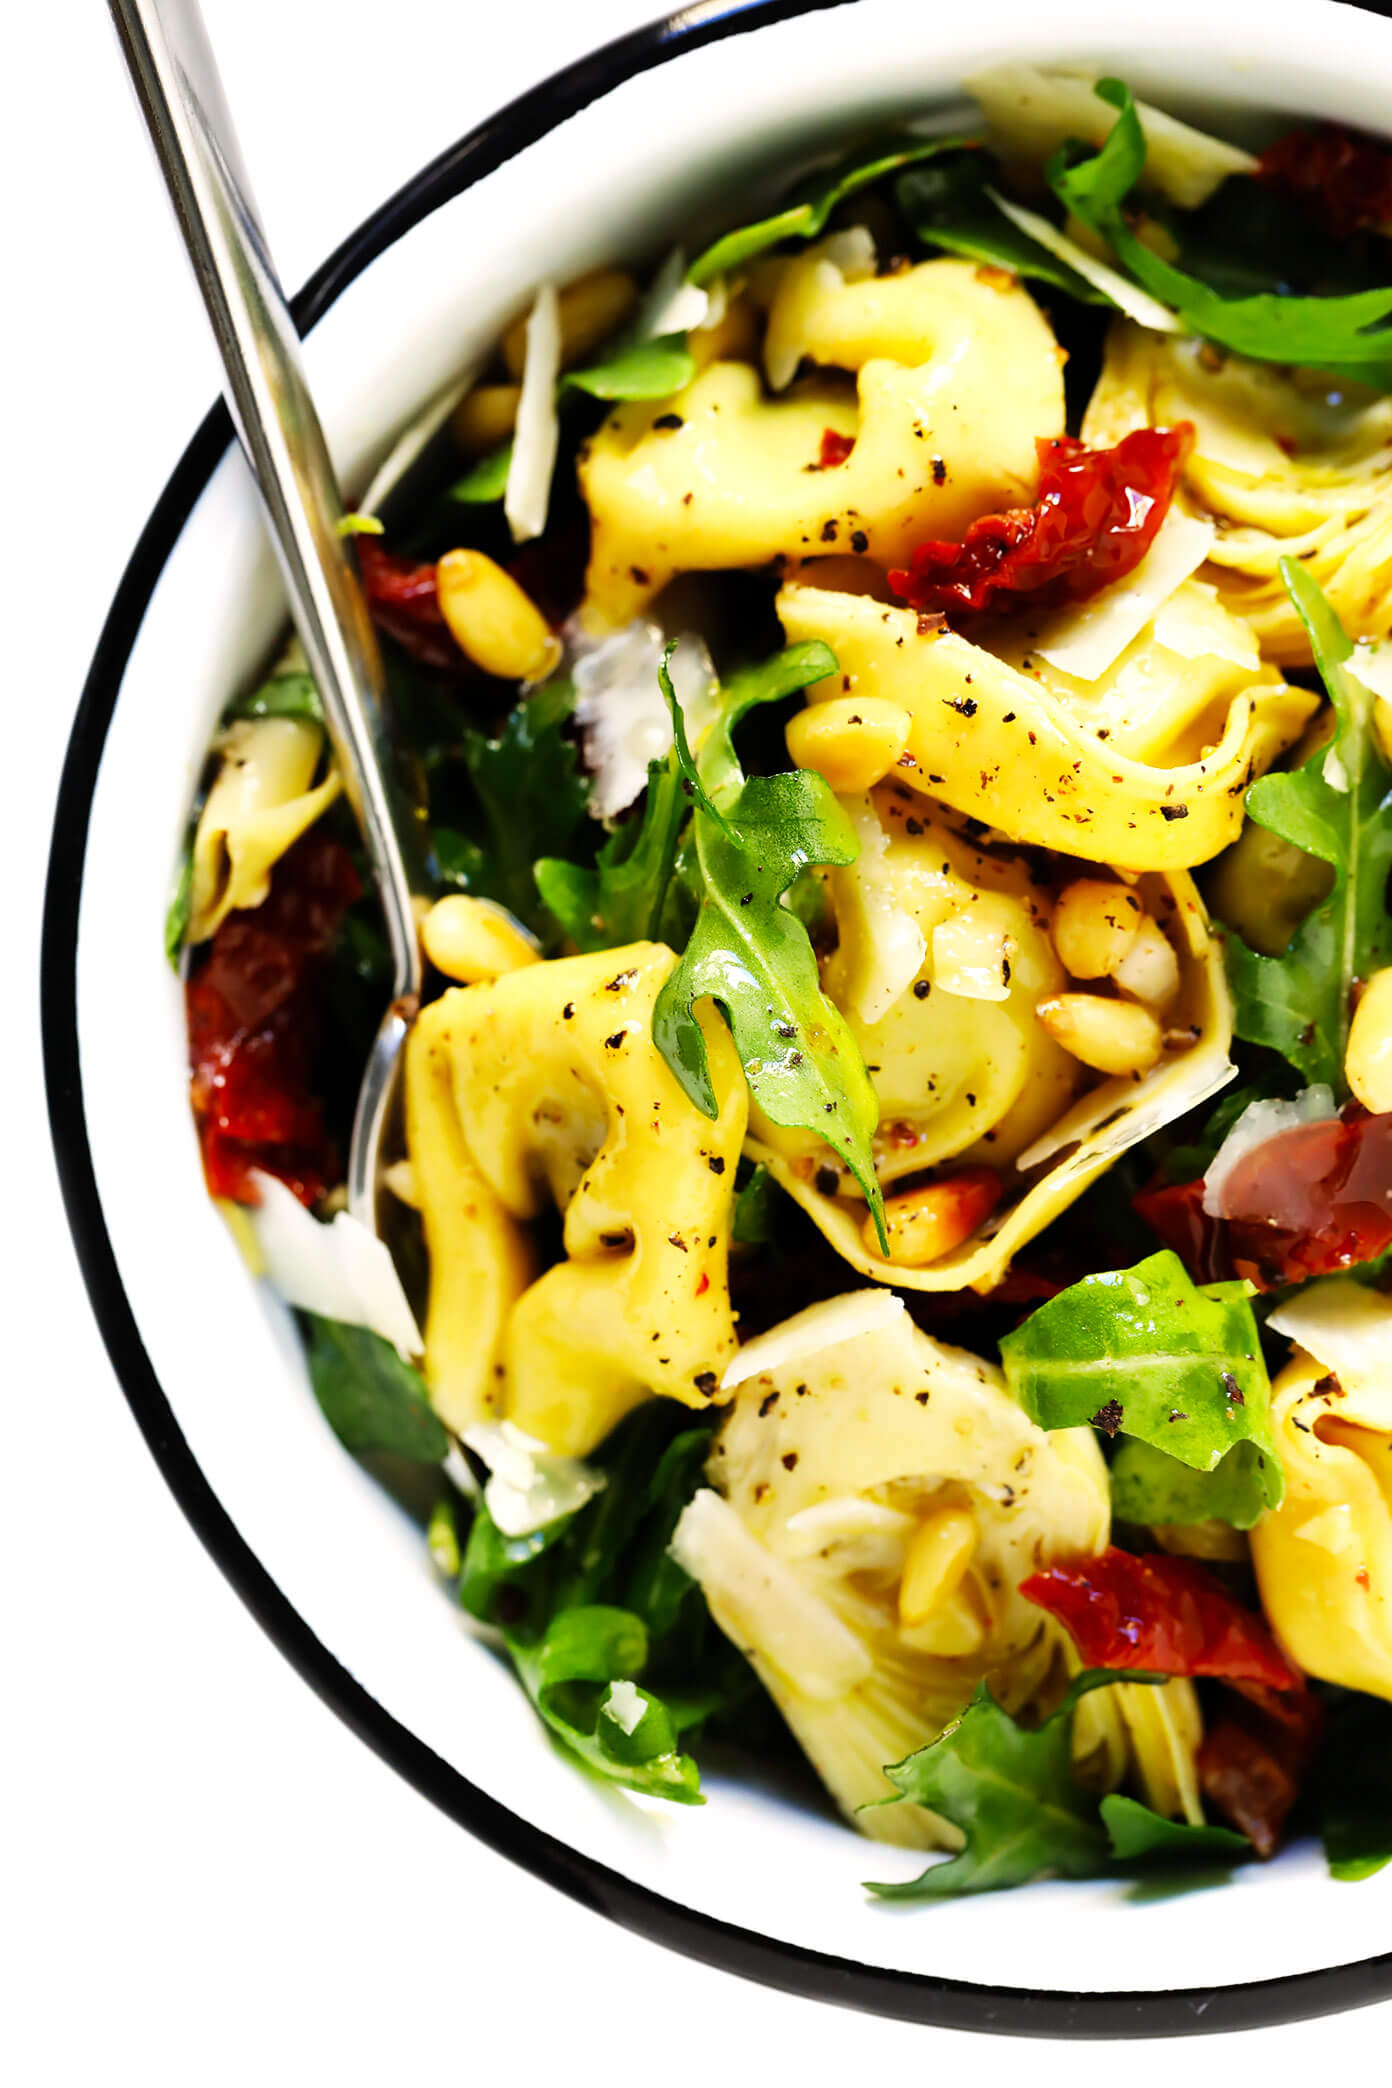 Tortellini Pasta Salad with Artichokes, Sun-Dried Tomatoes, Pine Nuts, Arugula and Parmesan